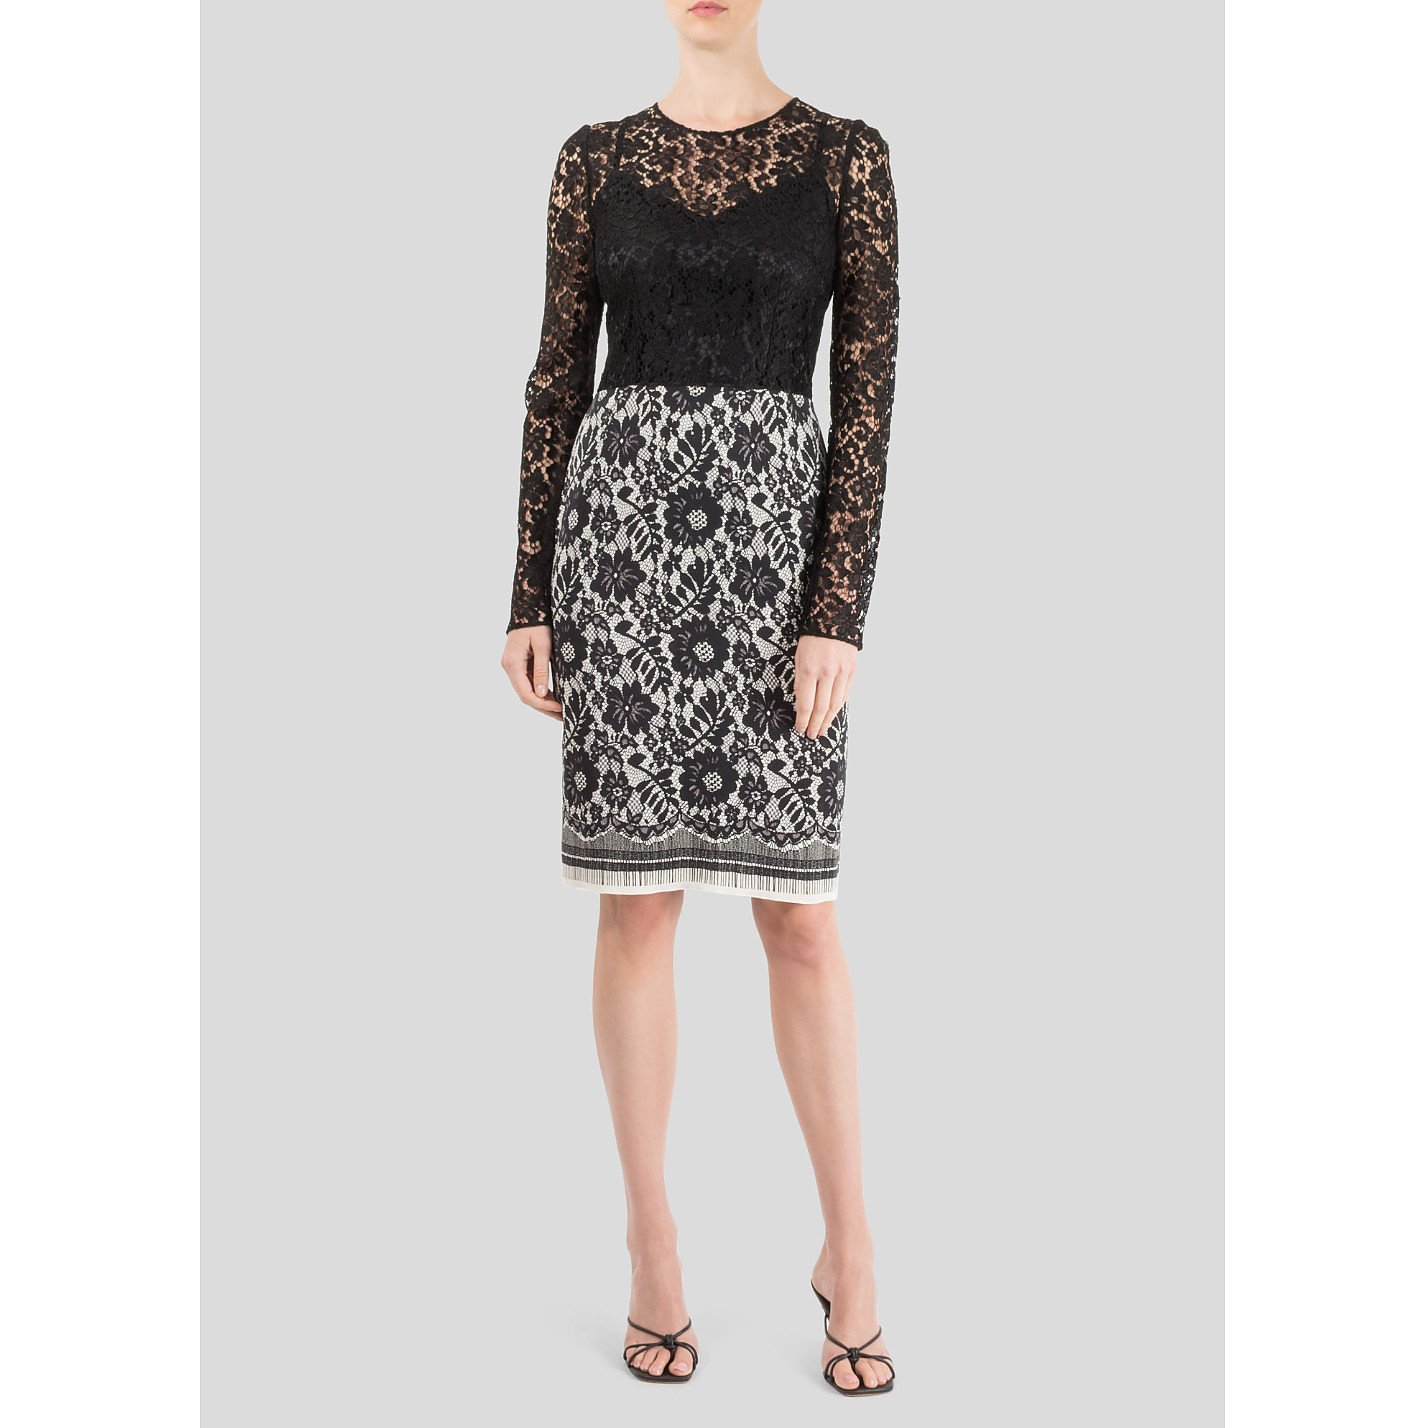 DOLCE & GABBANA Long Sleeve Monochrome Lace Dress